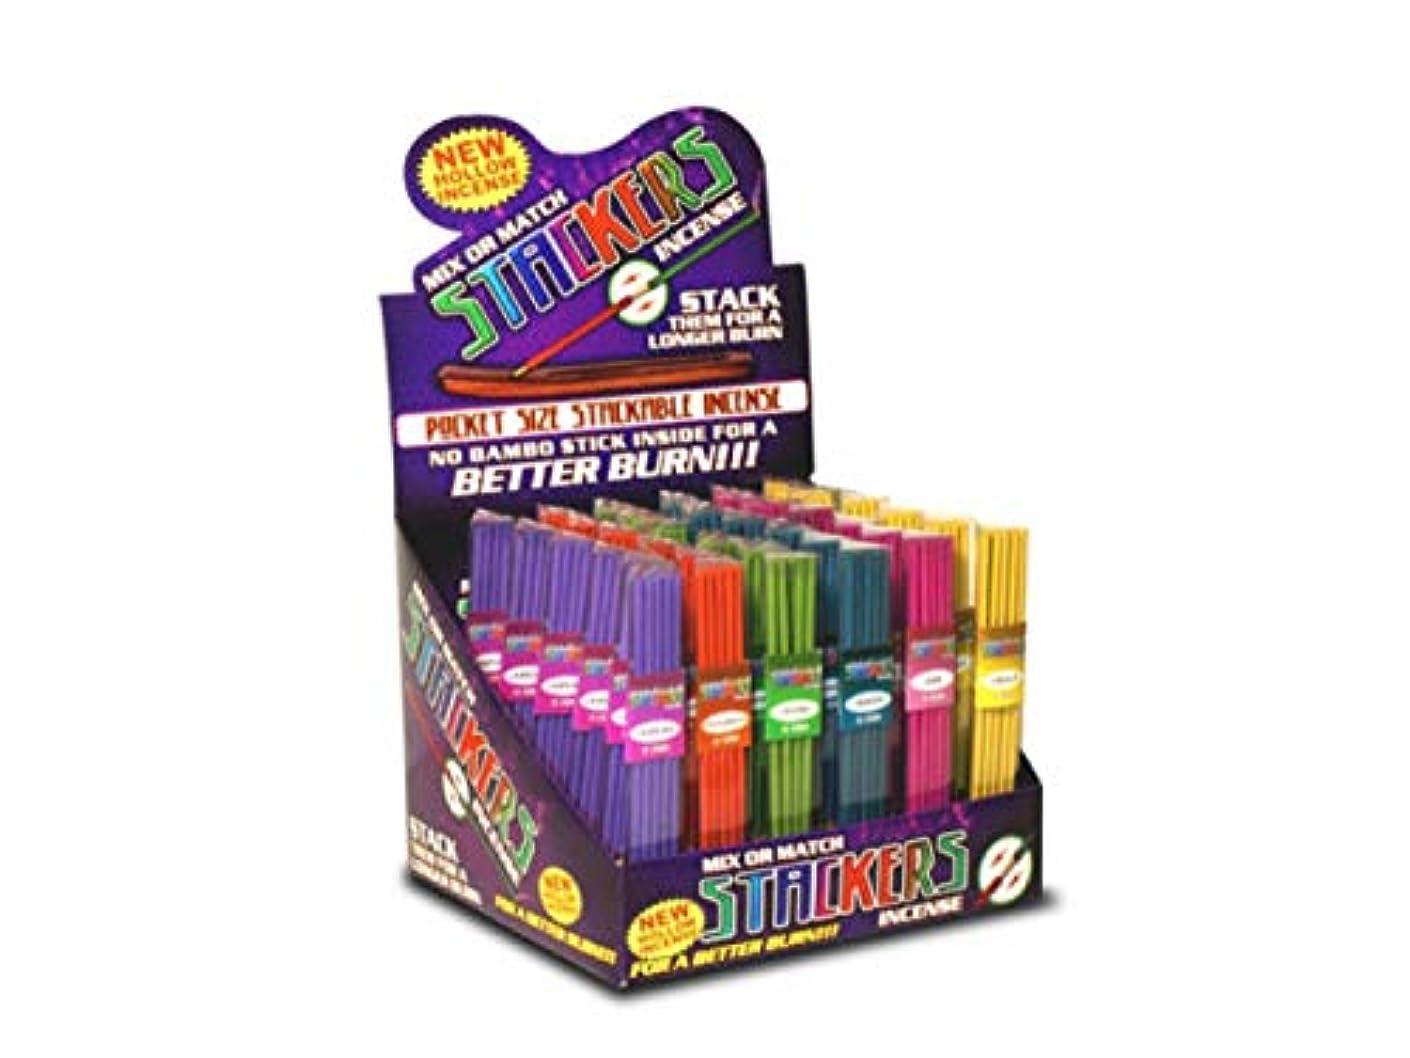 bulk buys Stackers Mix Or Match 多様なお香カウンタートップディスプレイ 36個セット